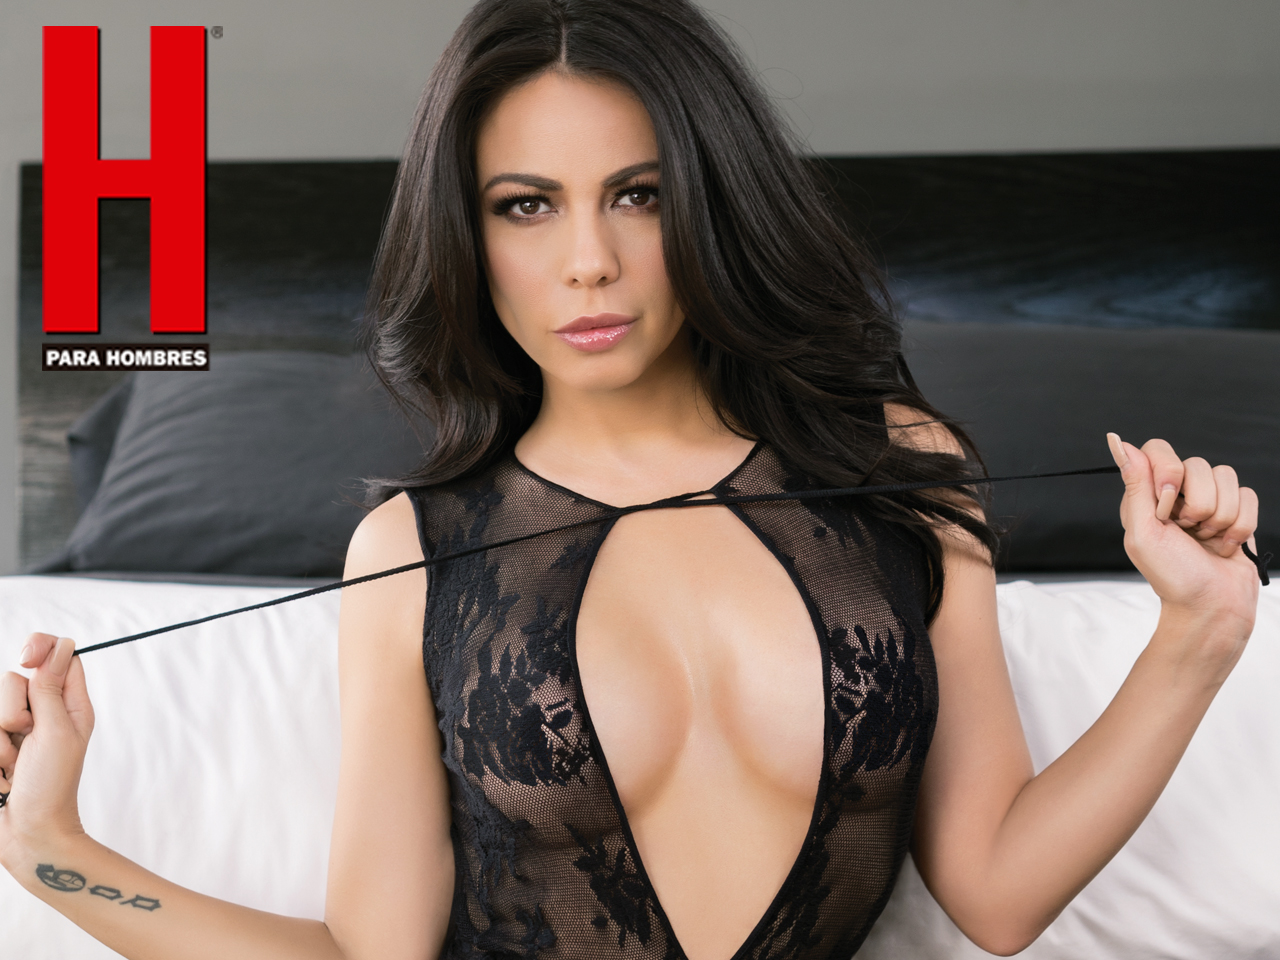 Jimena Sanchez Revista H Enero 2016 – ELBLOOG